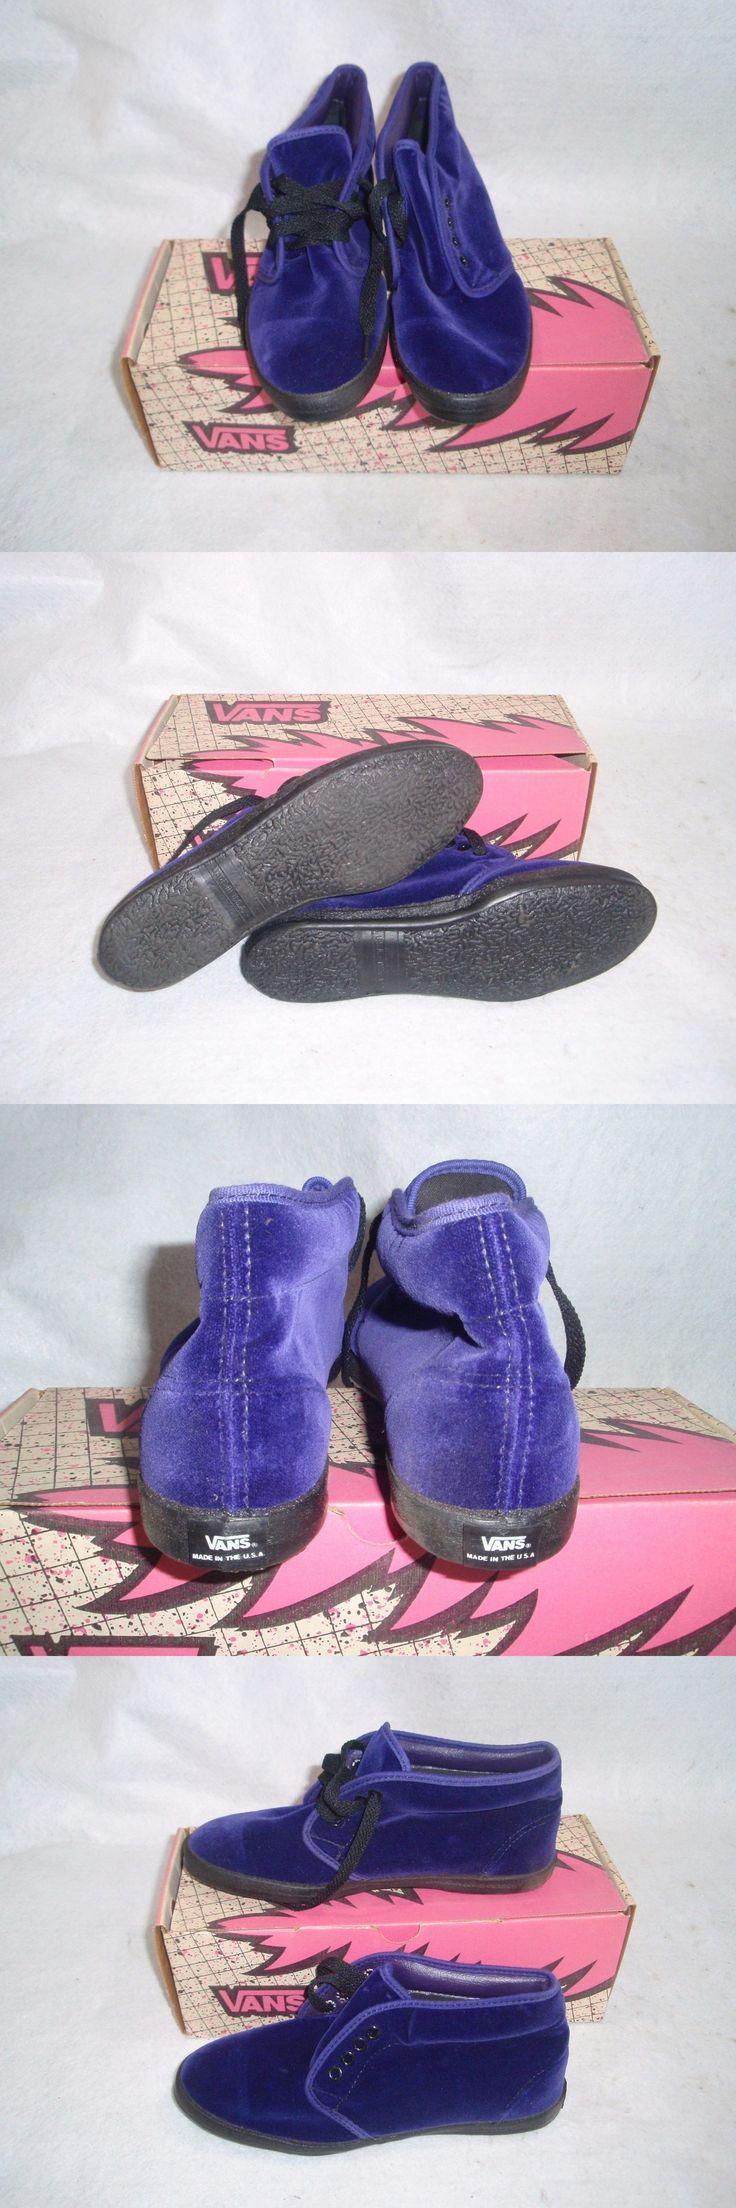 Women 159071: Nos Vintage 1990 Vans Chukka Boot Purple Velvet Wmns 6.5 Sk8 Bmx Shoes BUY IT NOW ONLY: $99.99